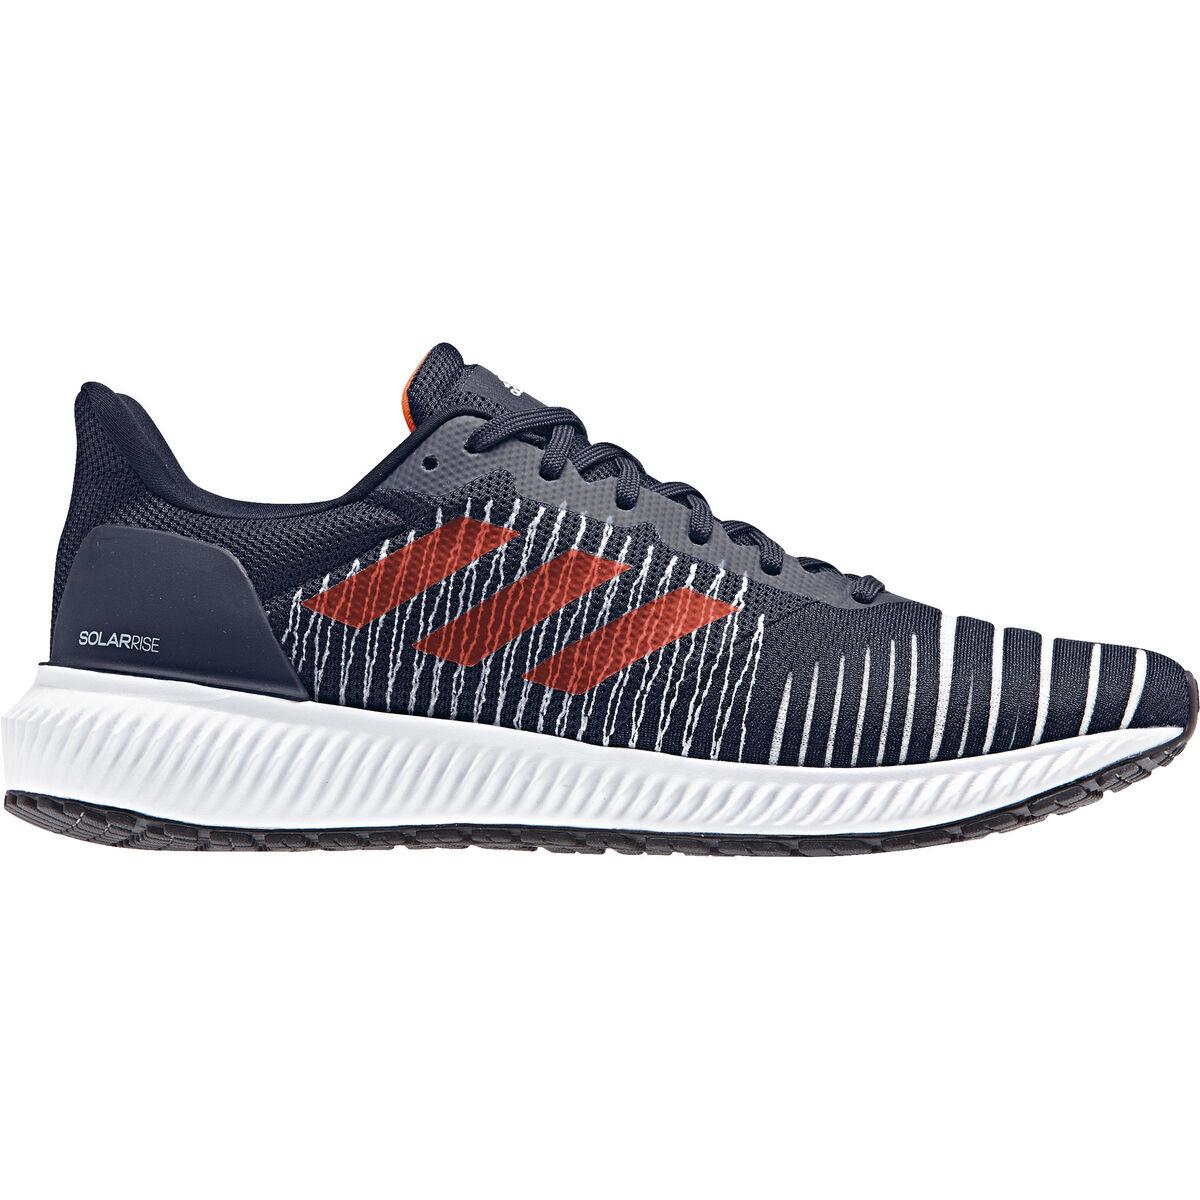 adidas Solar Ride Adiwear™ Herren Runningschuh für 29,99€